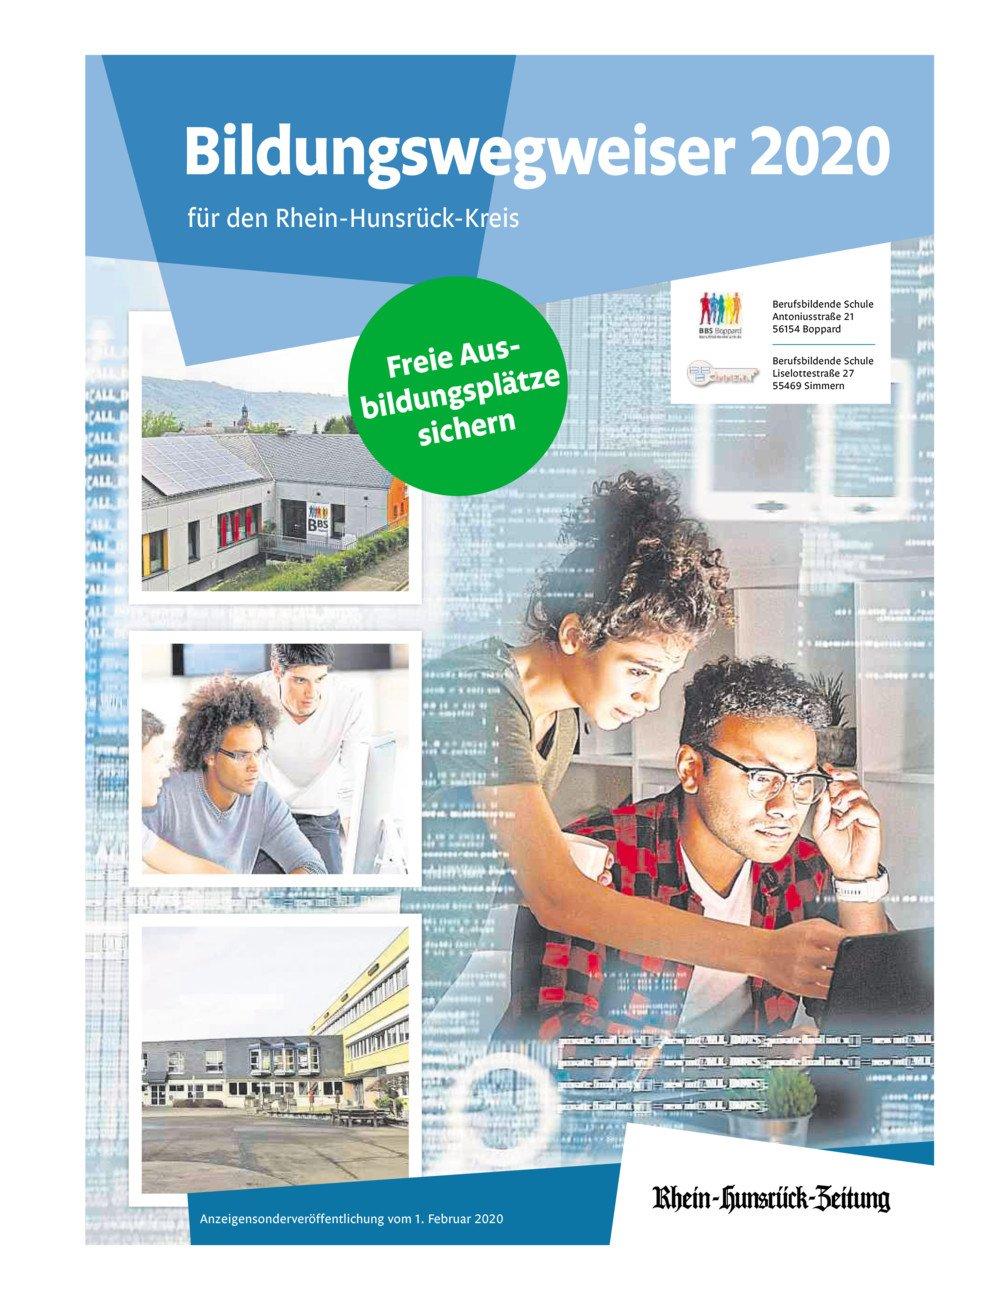 BBS Simmern & Boppard 2020